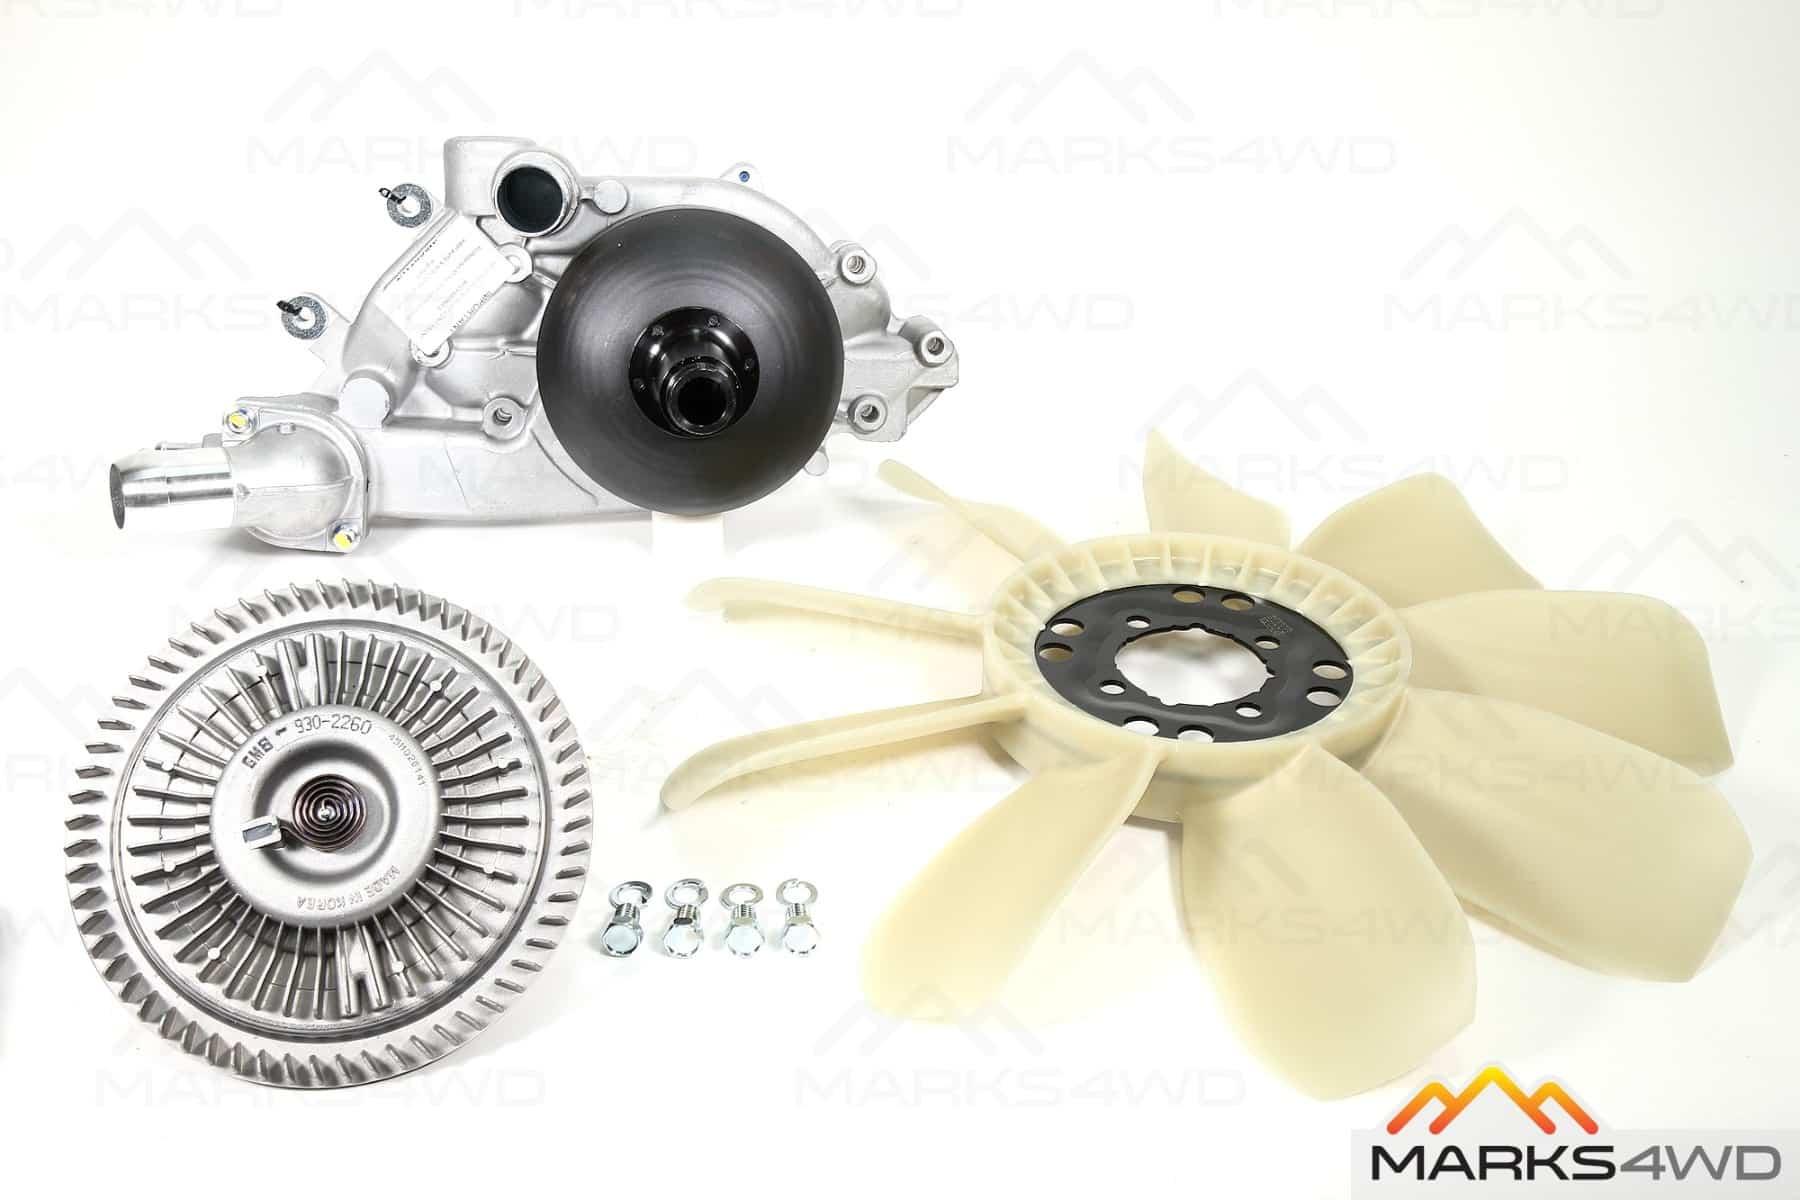 Viscous Fan Assembly - LS Series V8 Engines (LandCruiser / Patrol)